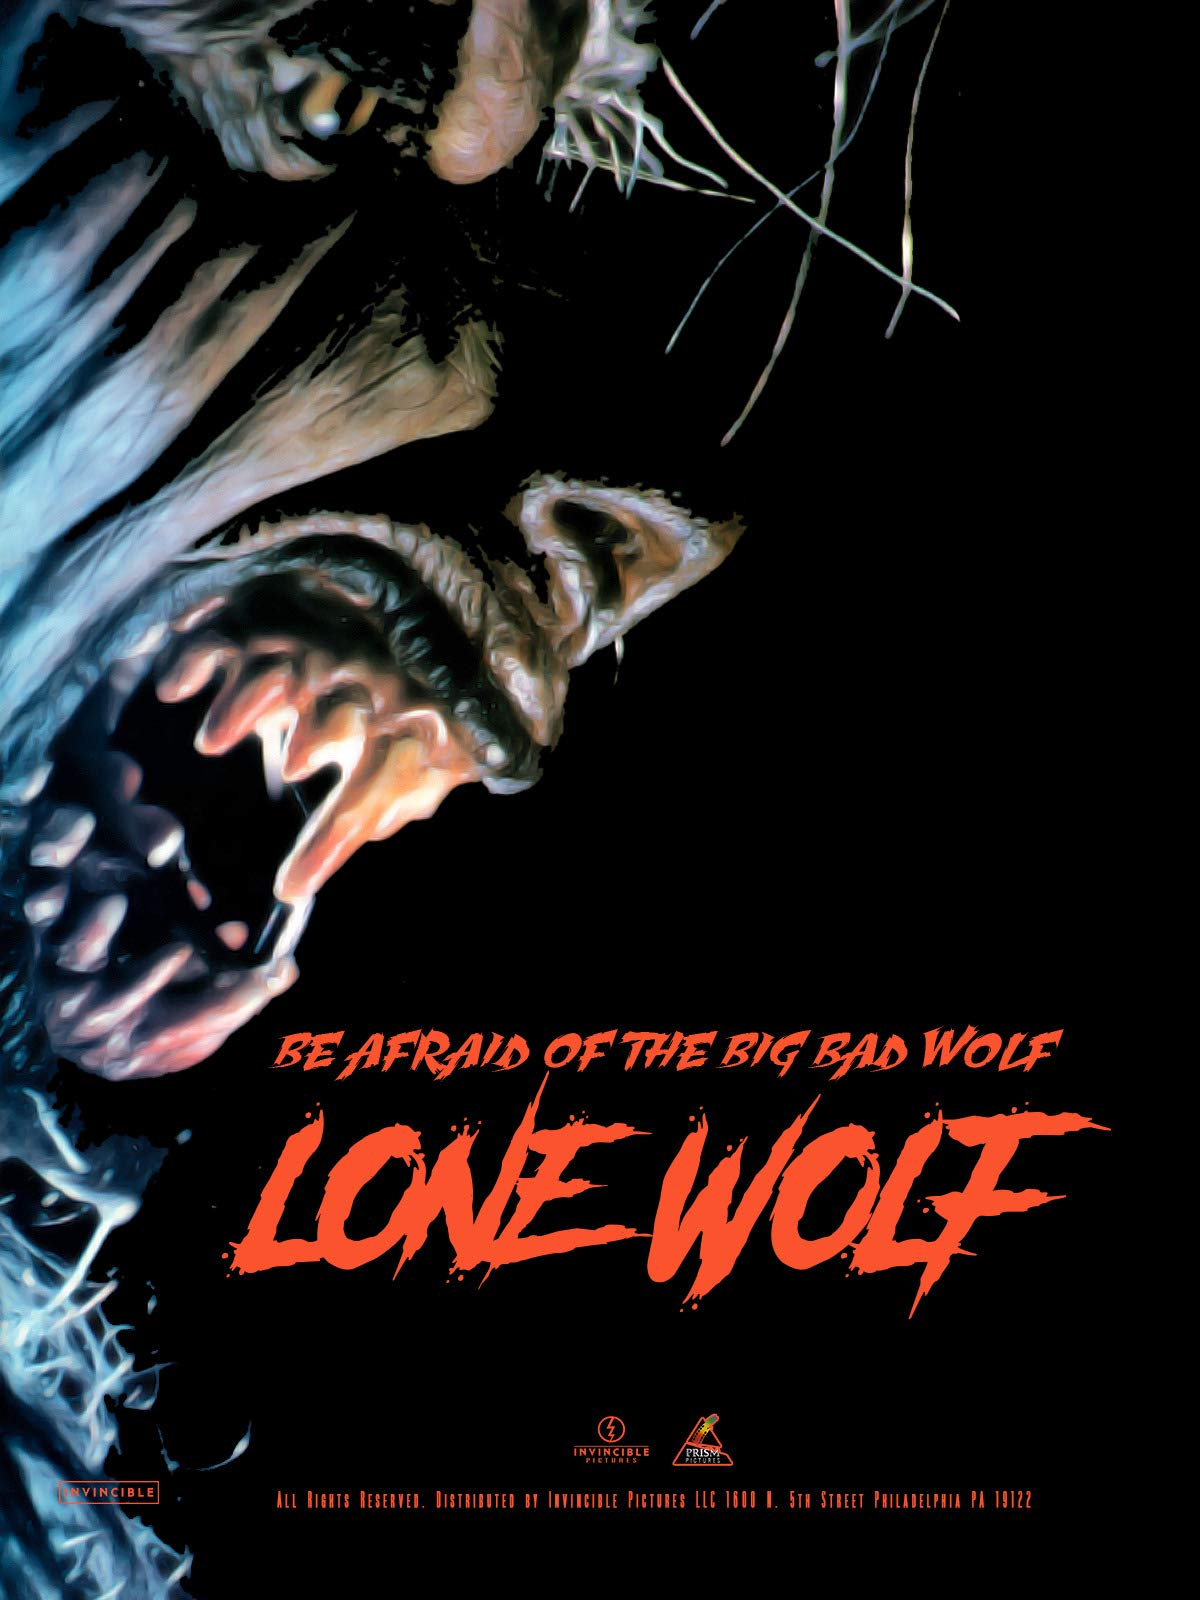 Lone_Wolf_1988_1